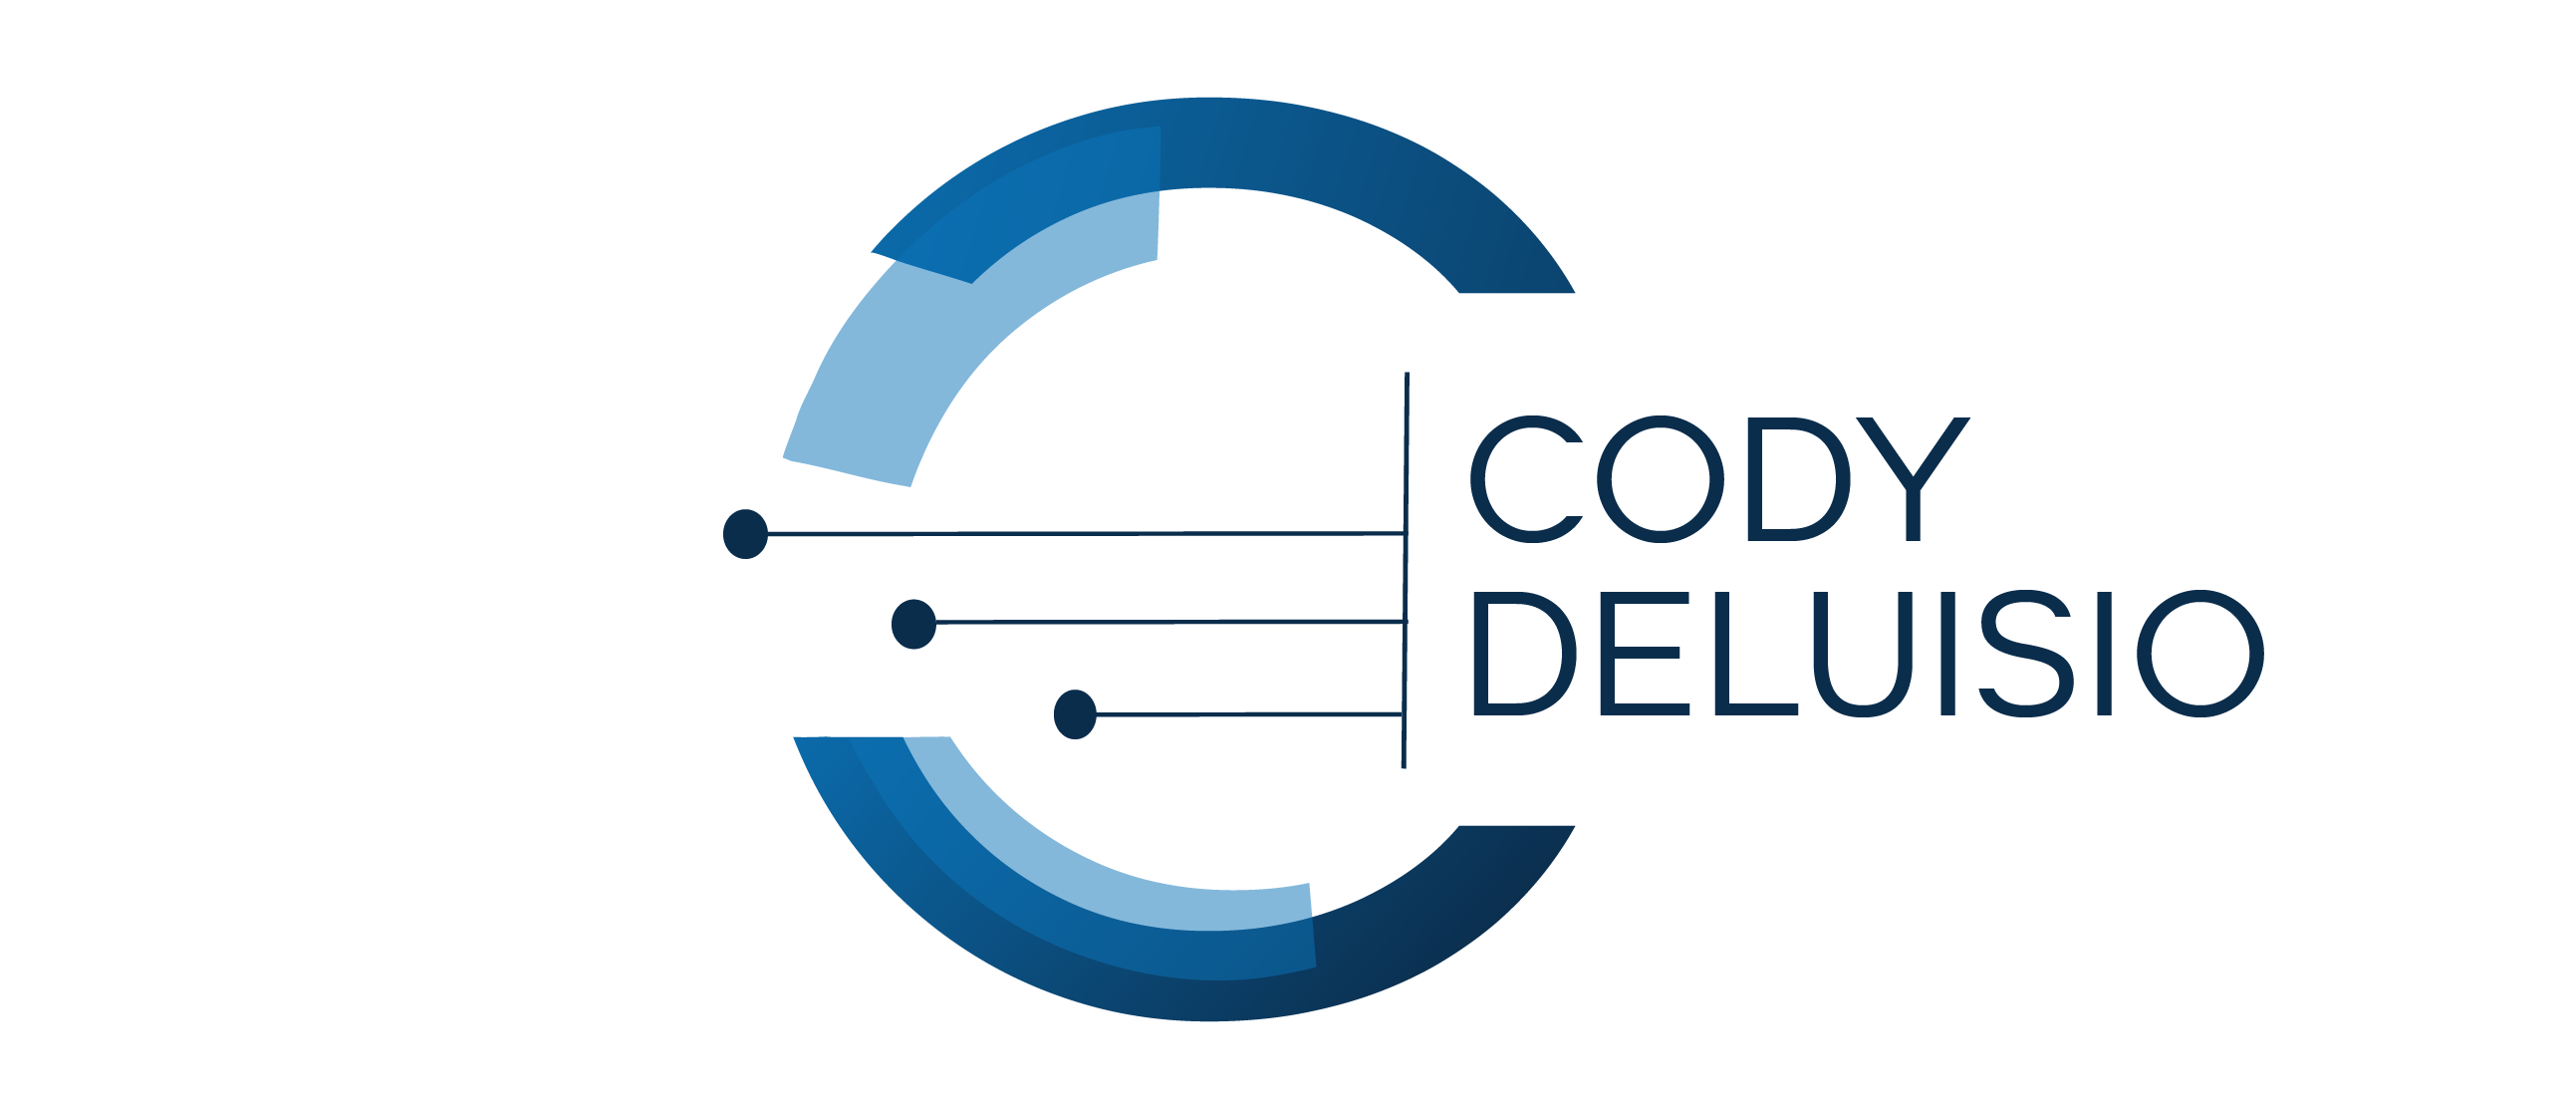 The blog of Cody Deluisio